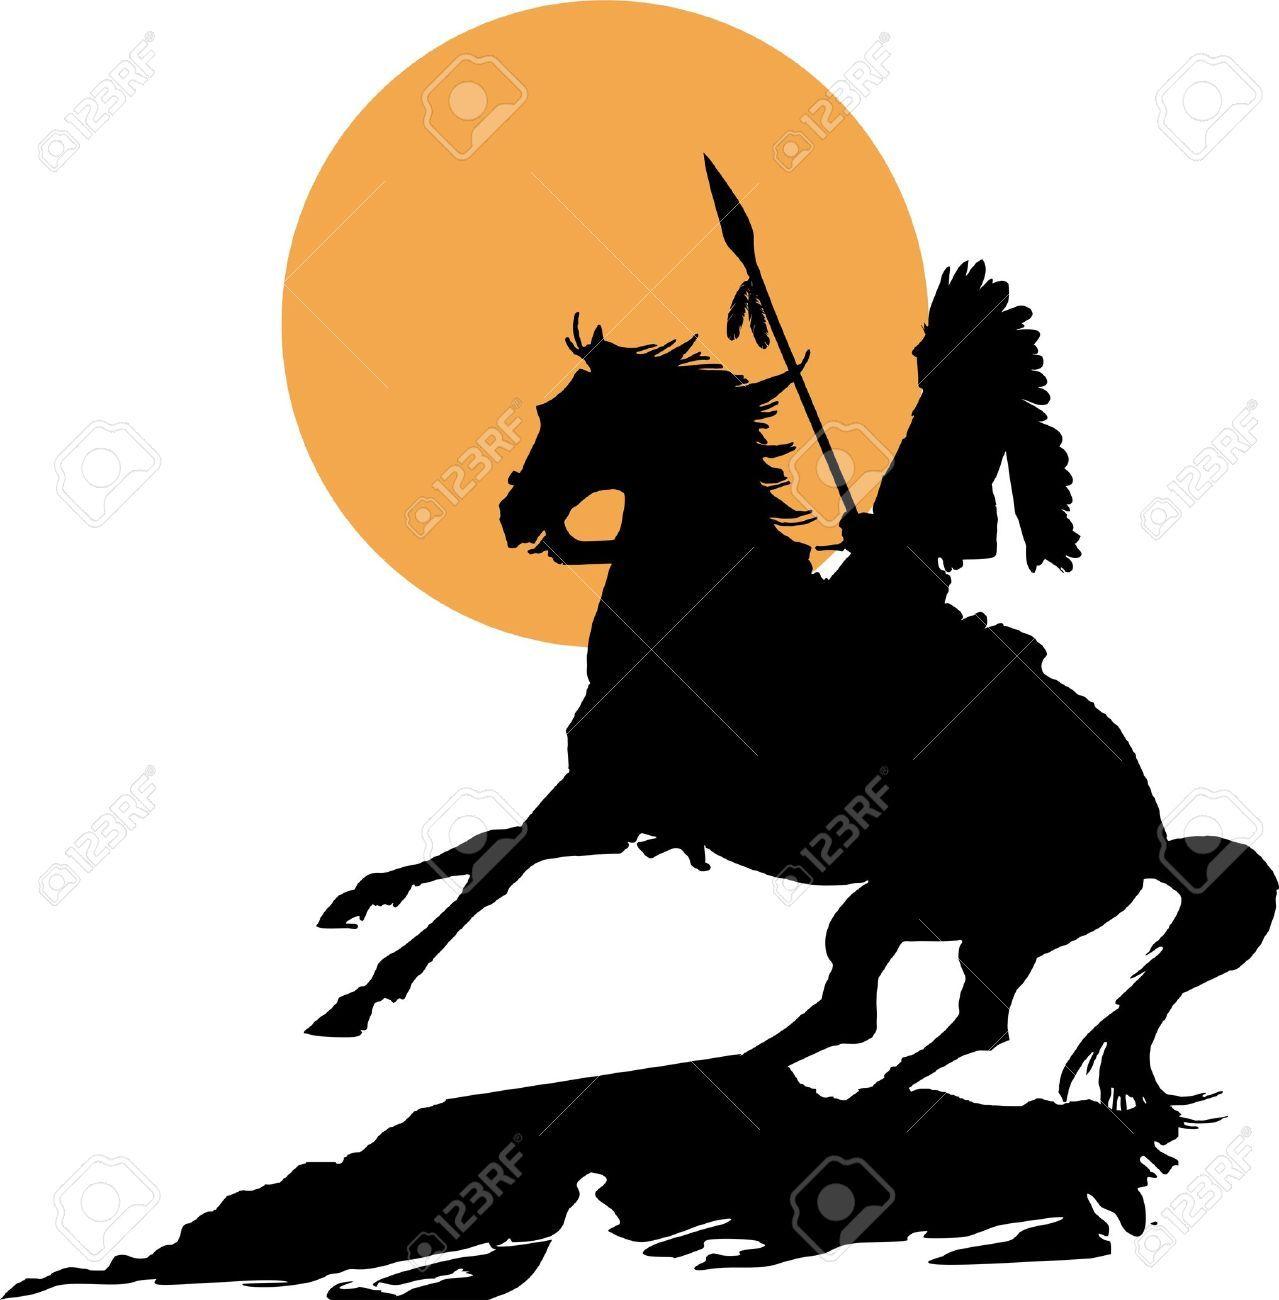 1279x1300 Native American On Horseback Native Indian Horse Silhouette